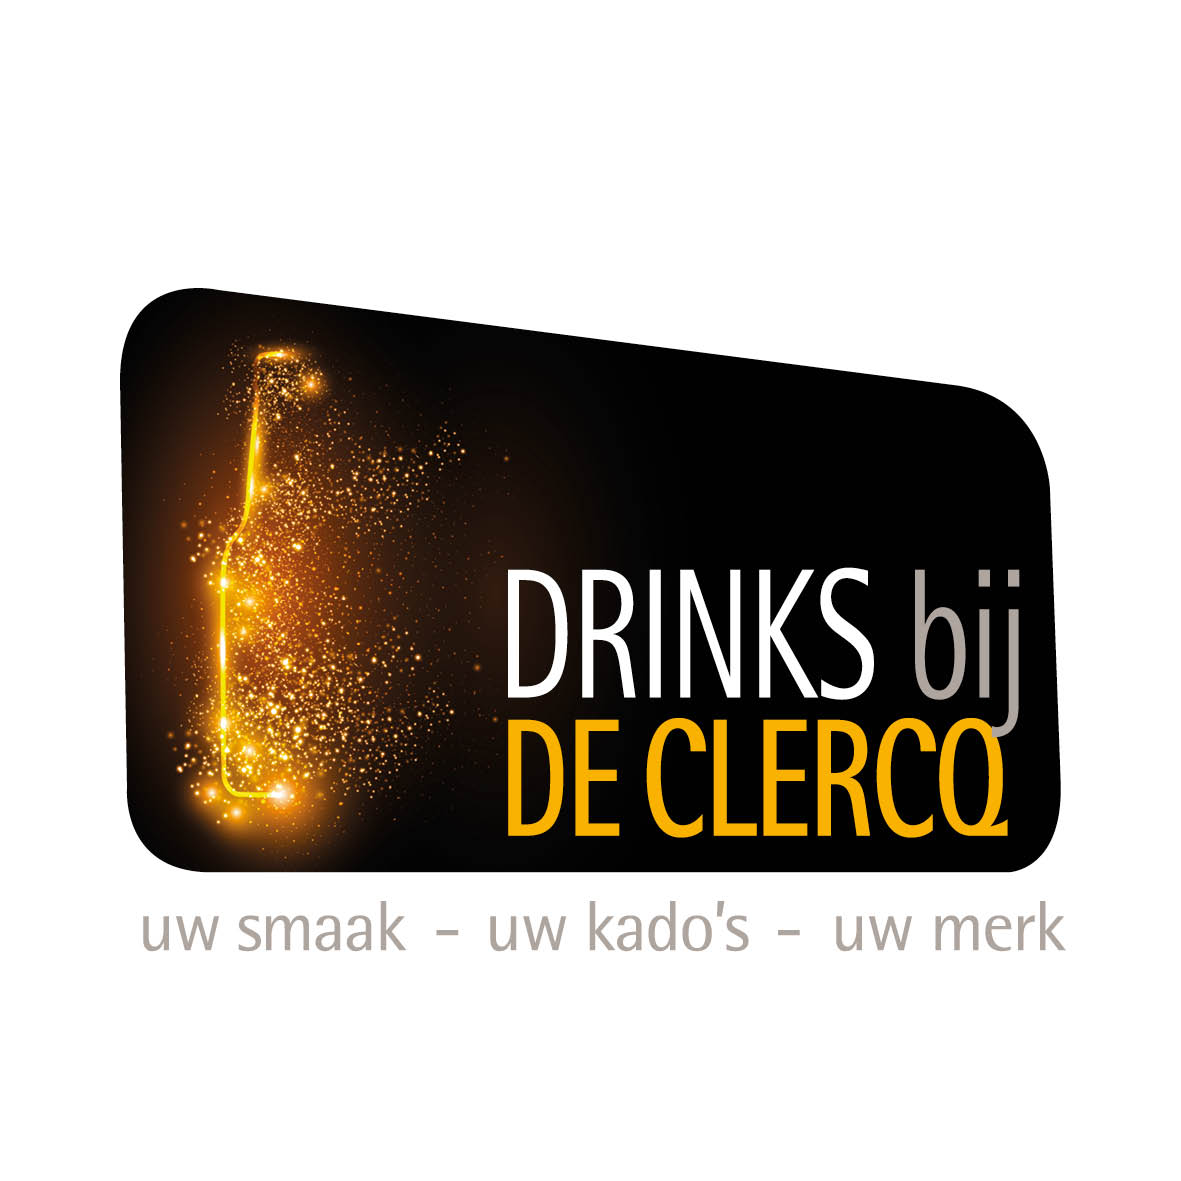 drinks-de-clercq-logo